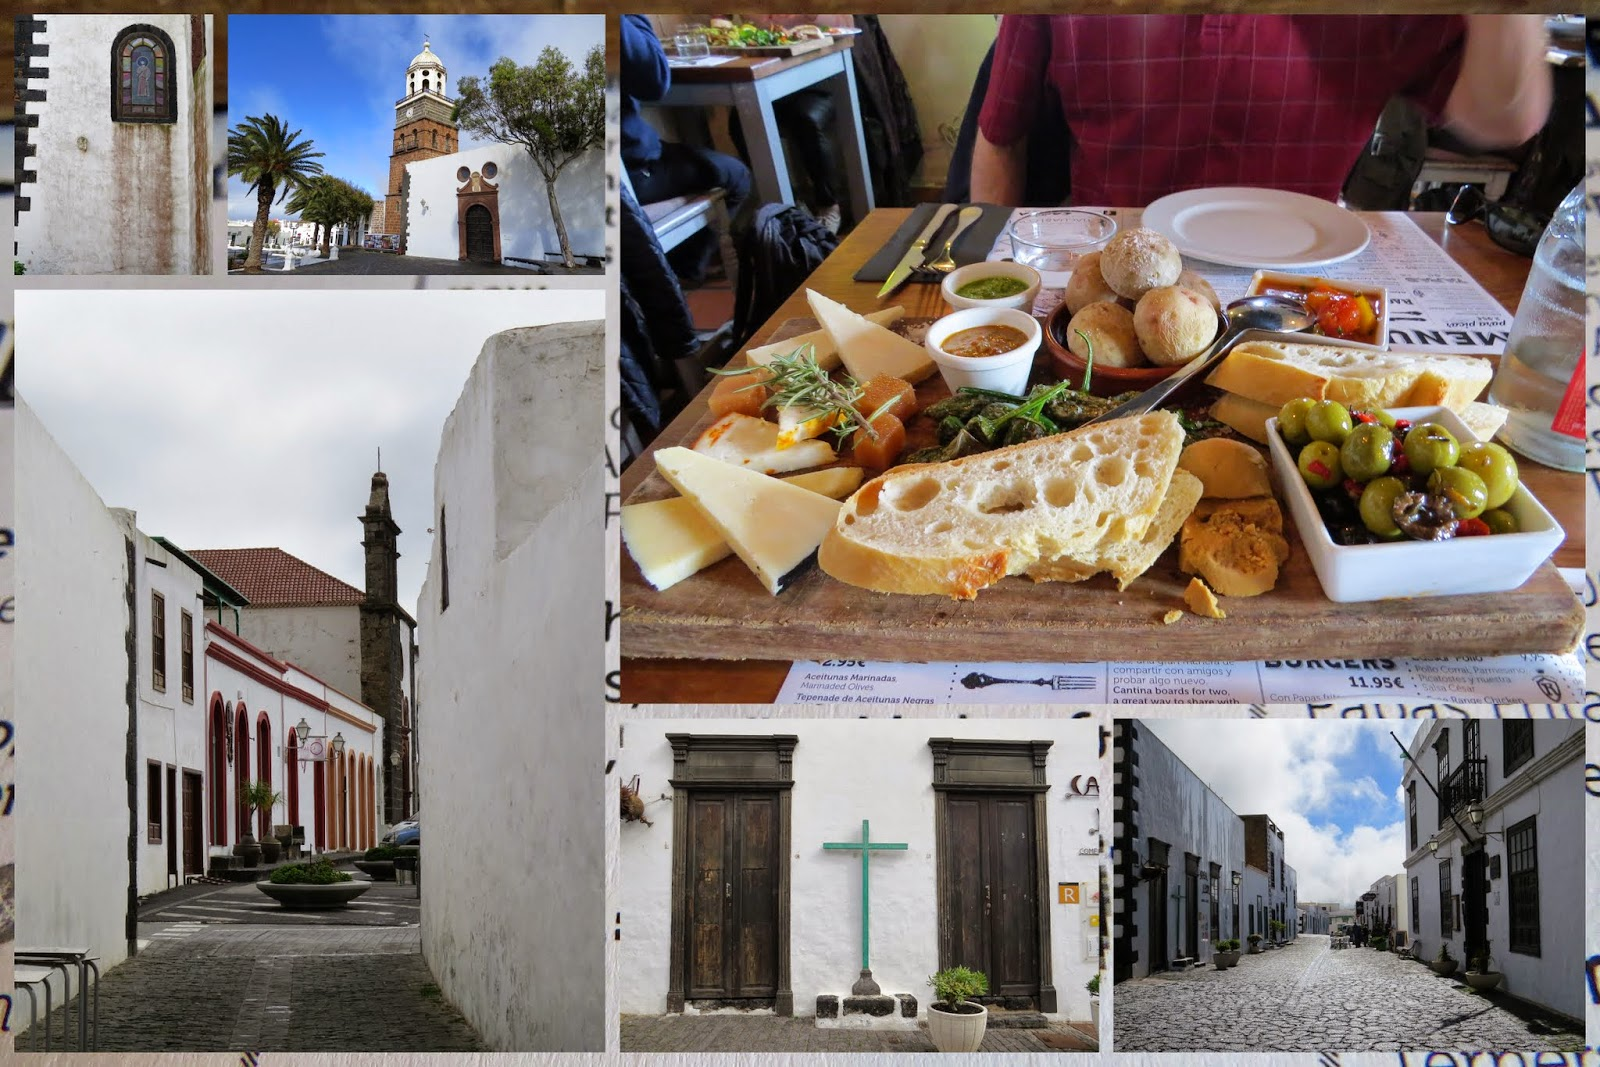 La Cantina Teguise - Lanzarote